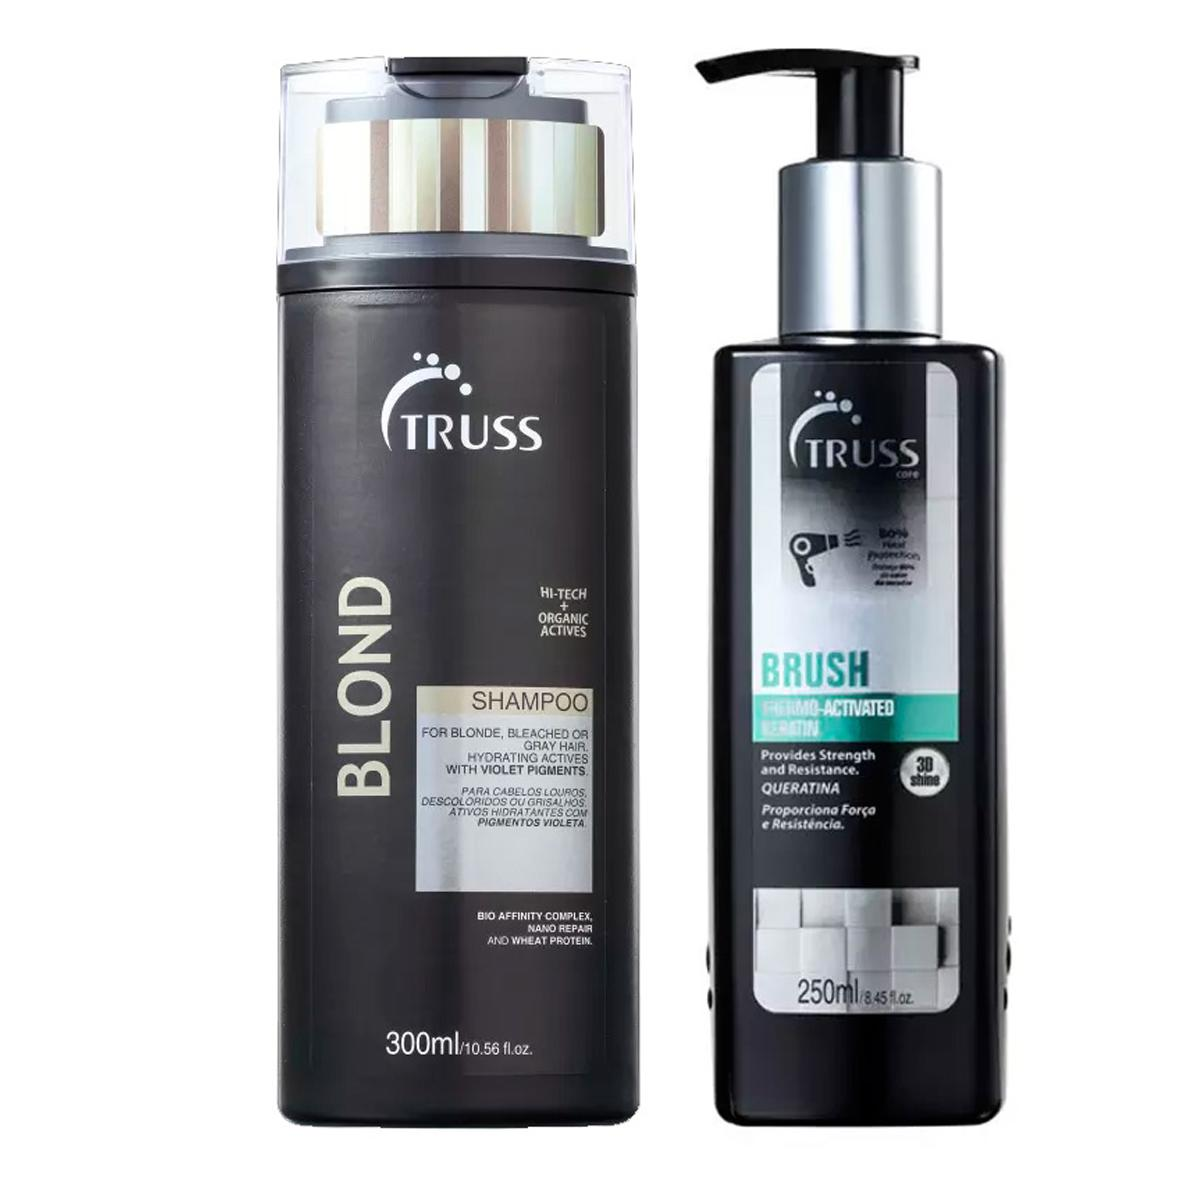 Kit Truss Blond Shampoo300ml e Brush250ml